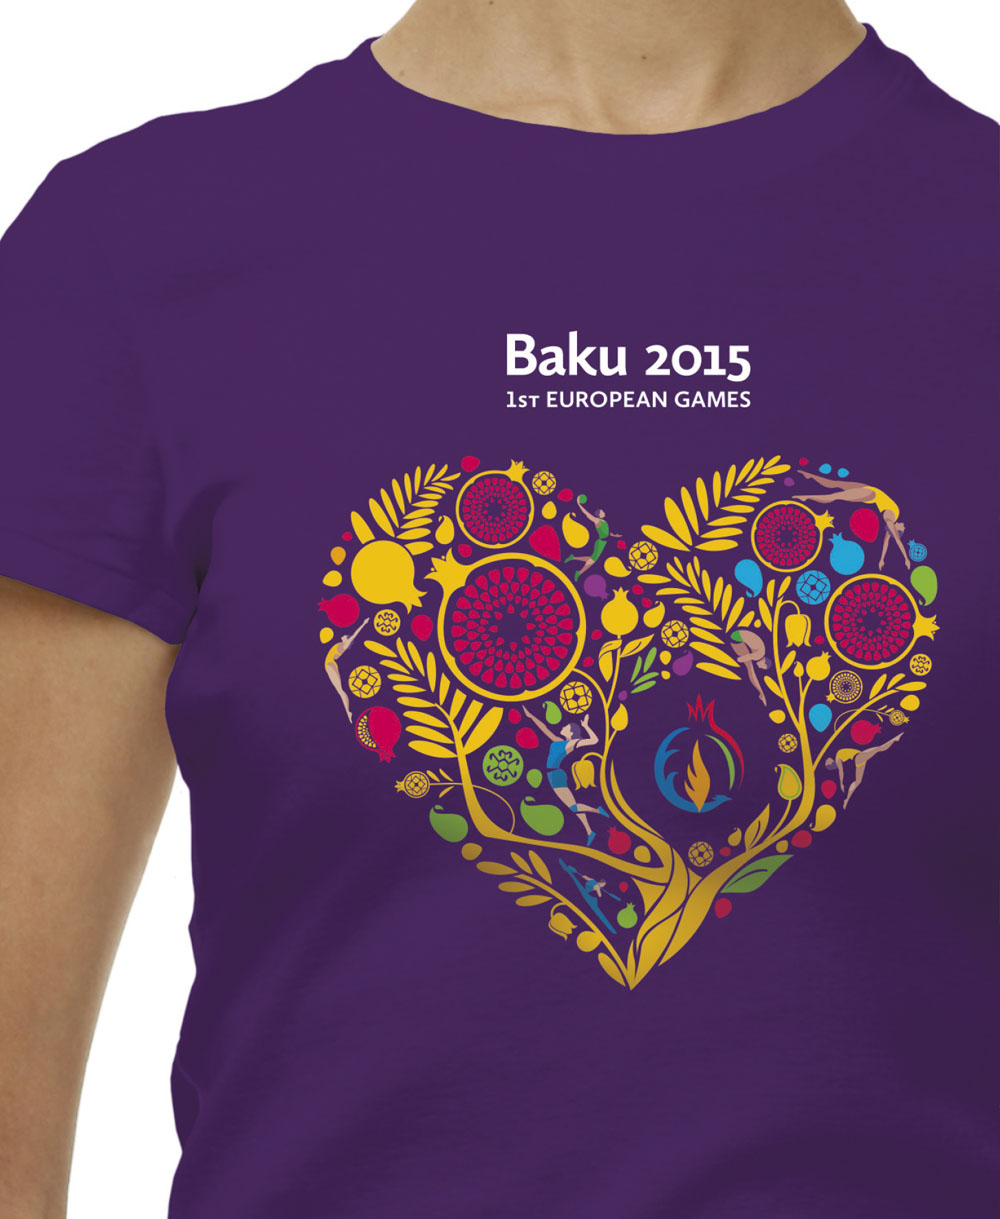 baku_2015_tshirt